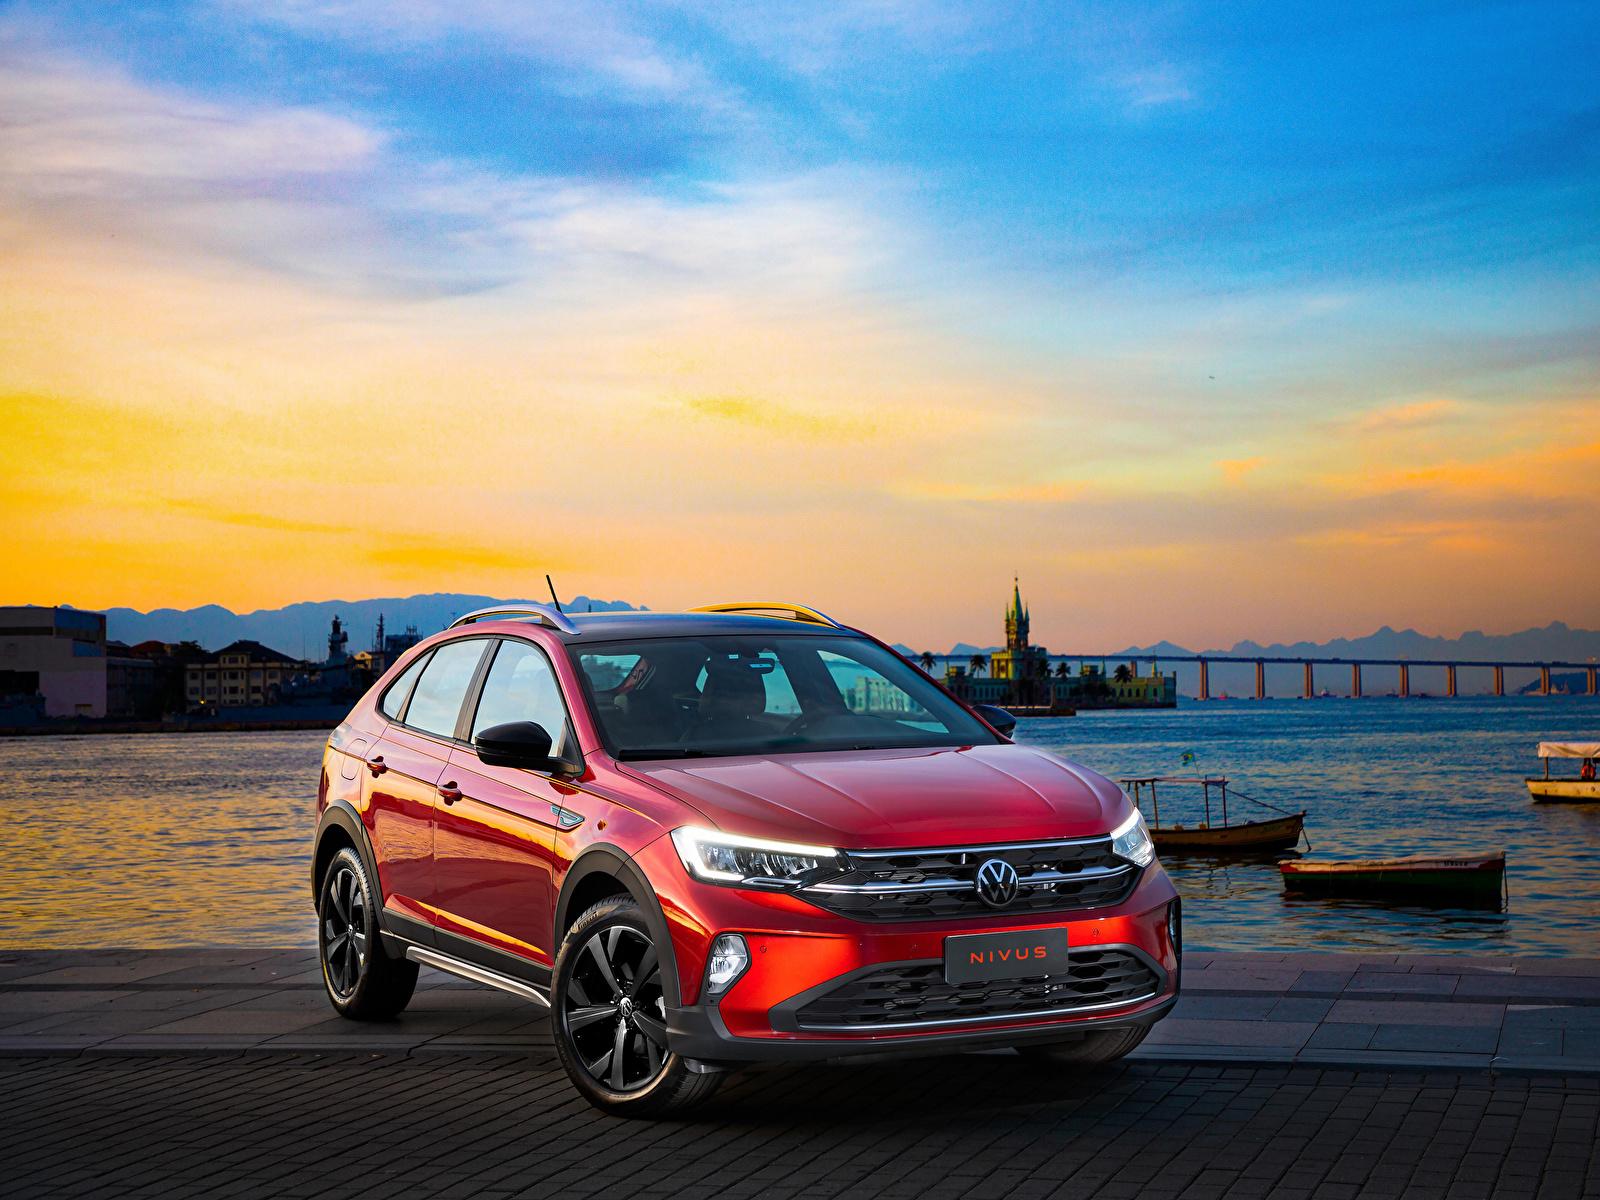 Desktop Hintergrundbilder Volkswagen 2020 Nivus Highline 200 TSI Launching Edition Latam Rot automobil Metallisch 1600x1200 auto Autos